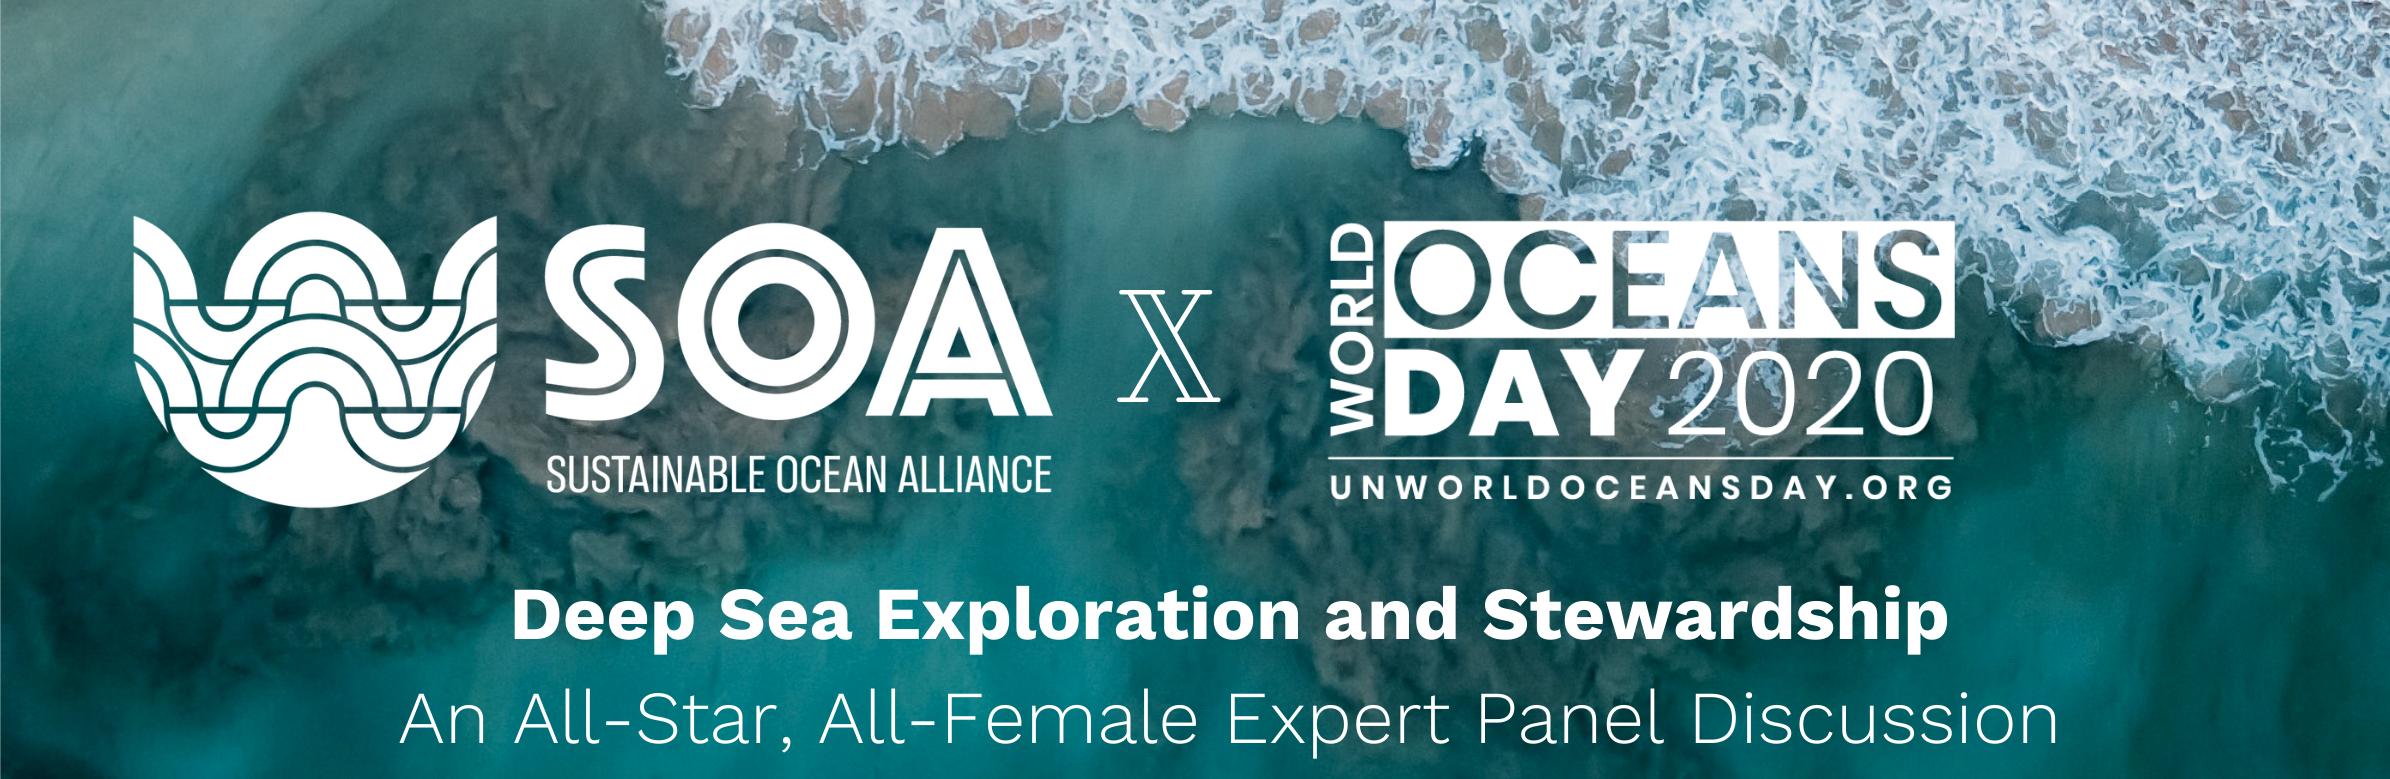 OLL UN world oceans day email header (2)